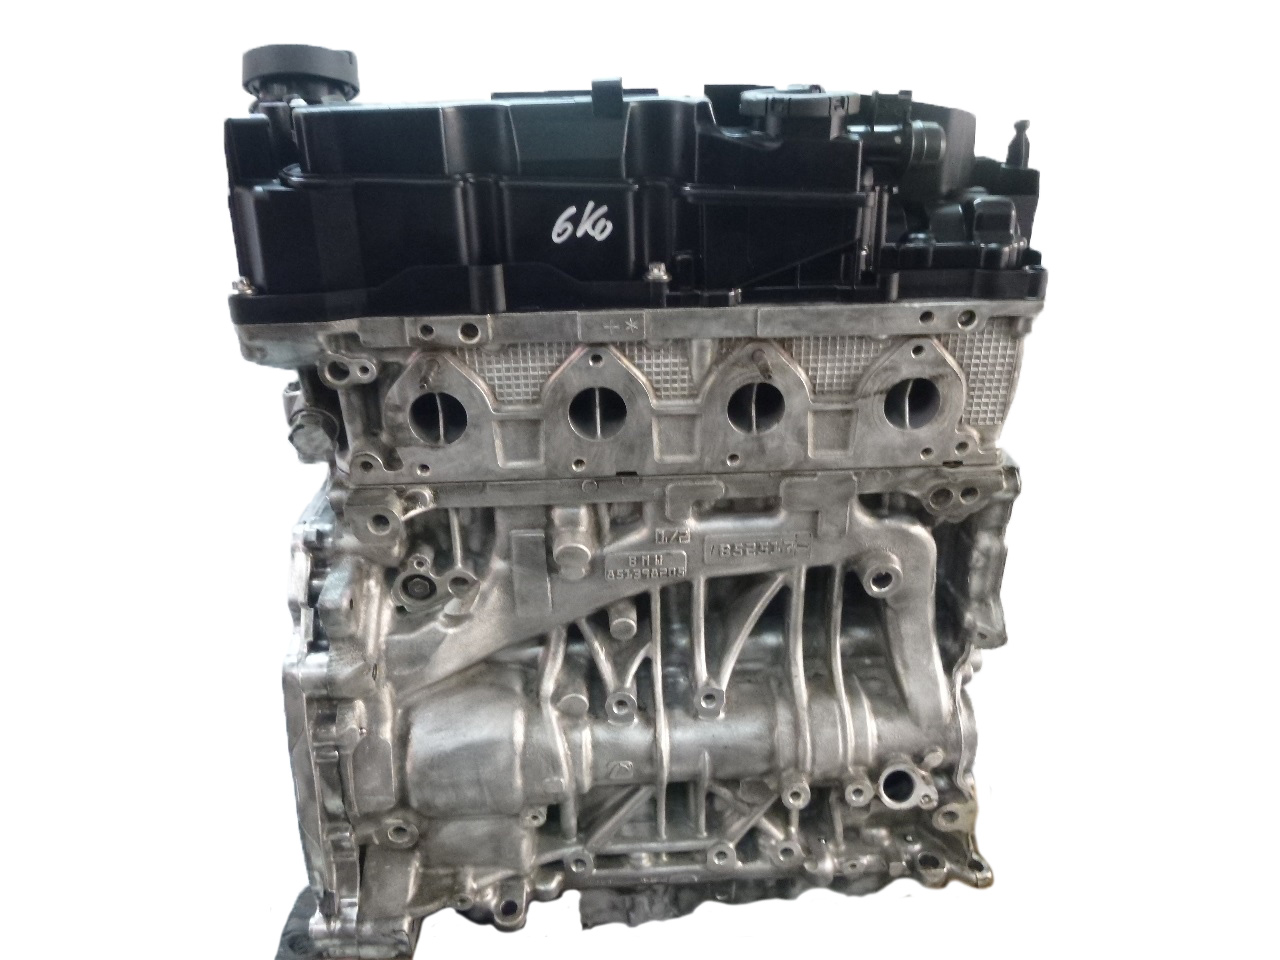 Motor BMW F30 F34 F31 F32 F21 F36 F45 F23 F10 F20 2,0 Diesel B47D20A